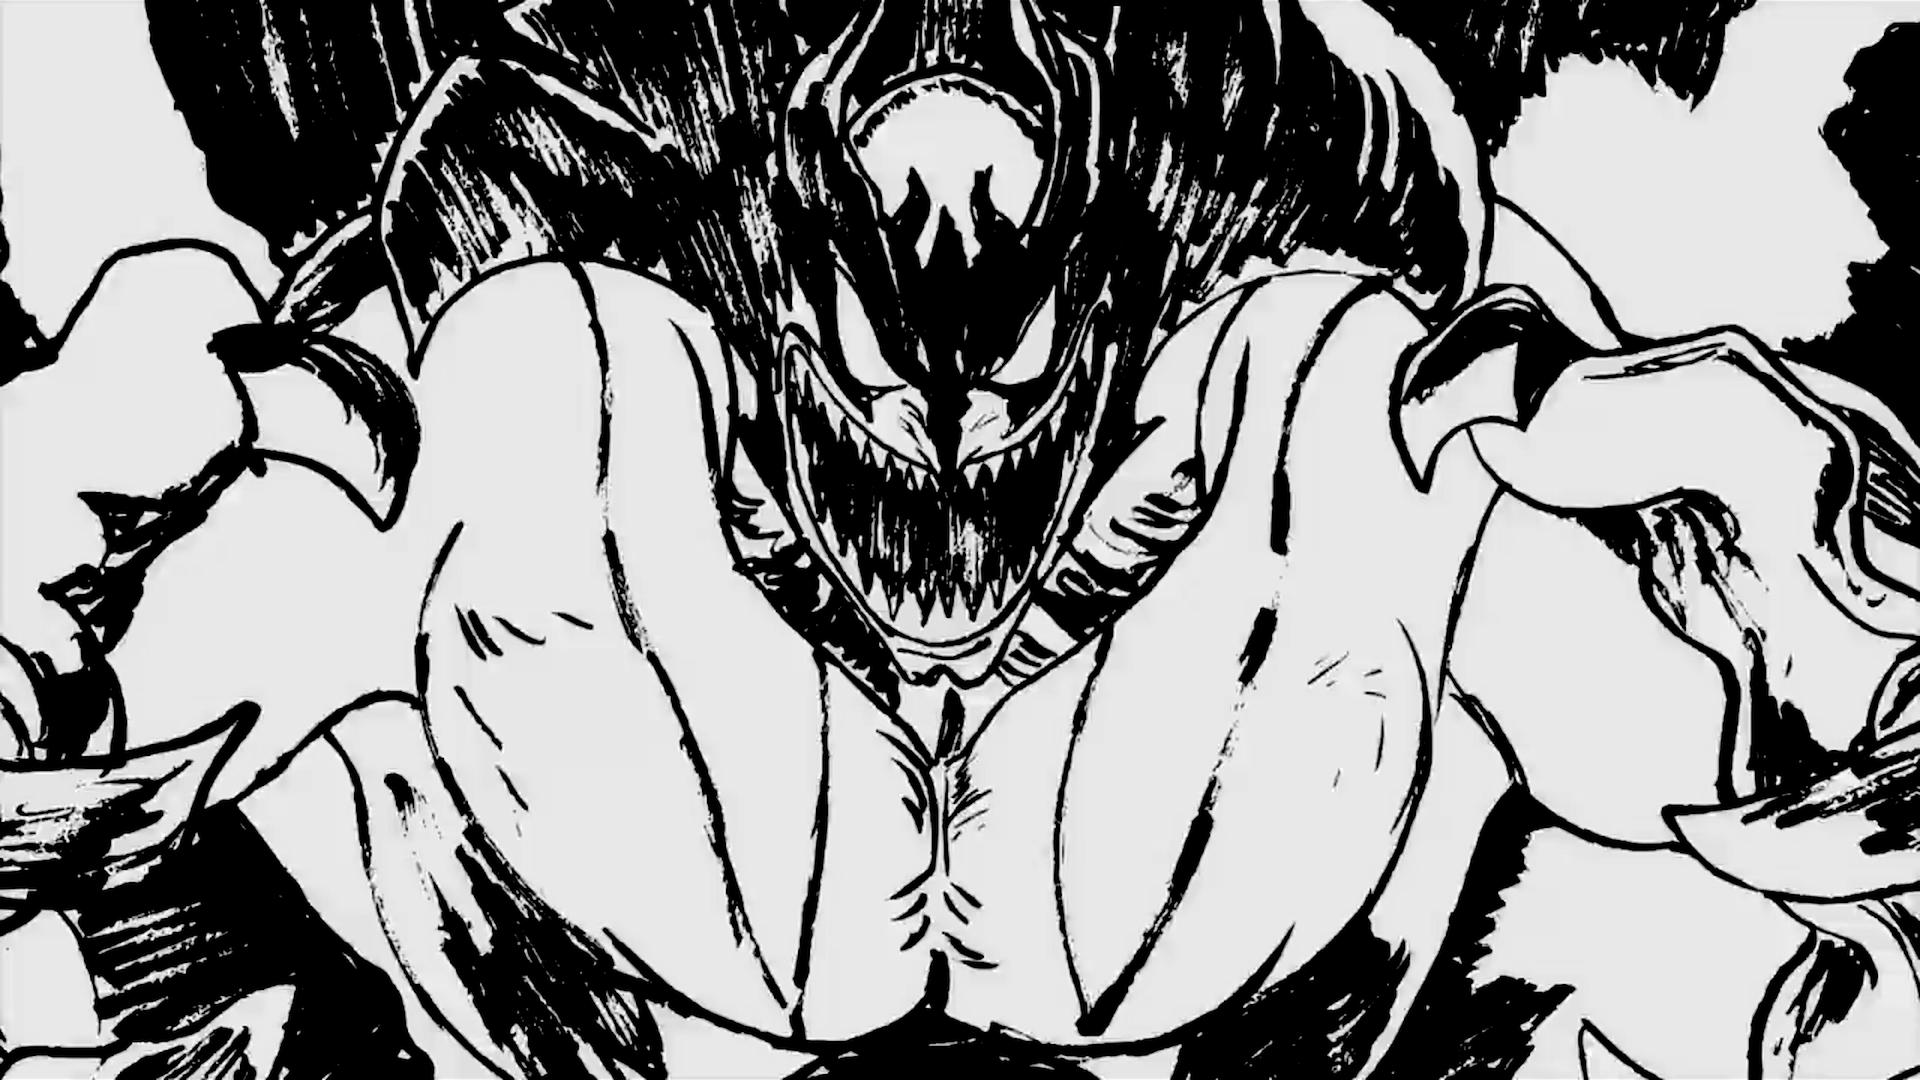 Manga Devilman HD Wallpaper   Background Image   1920x1080 ...